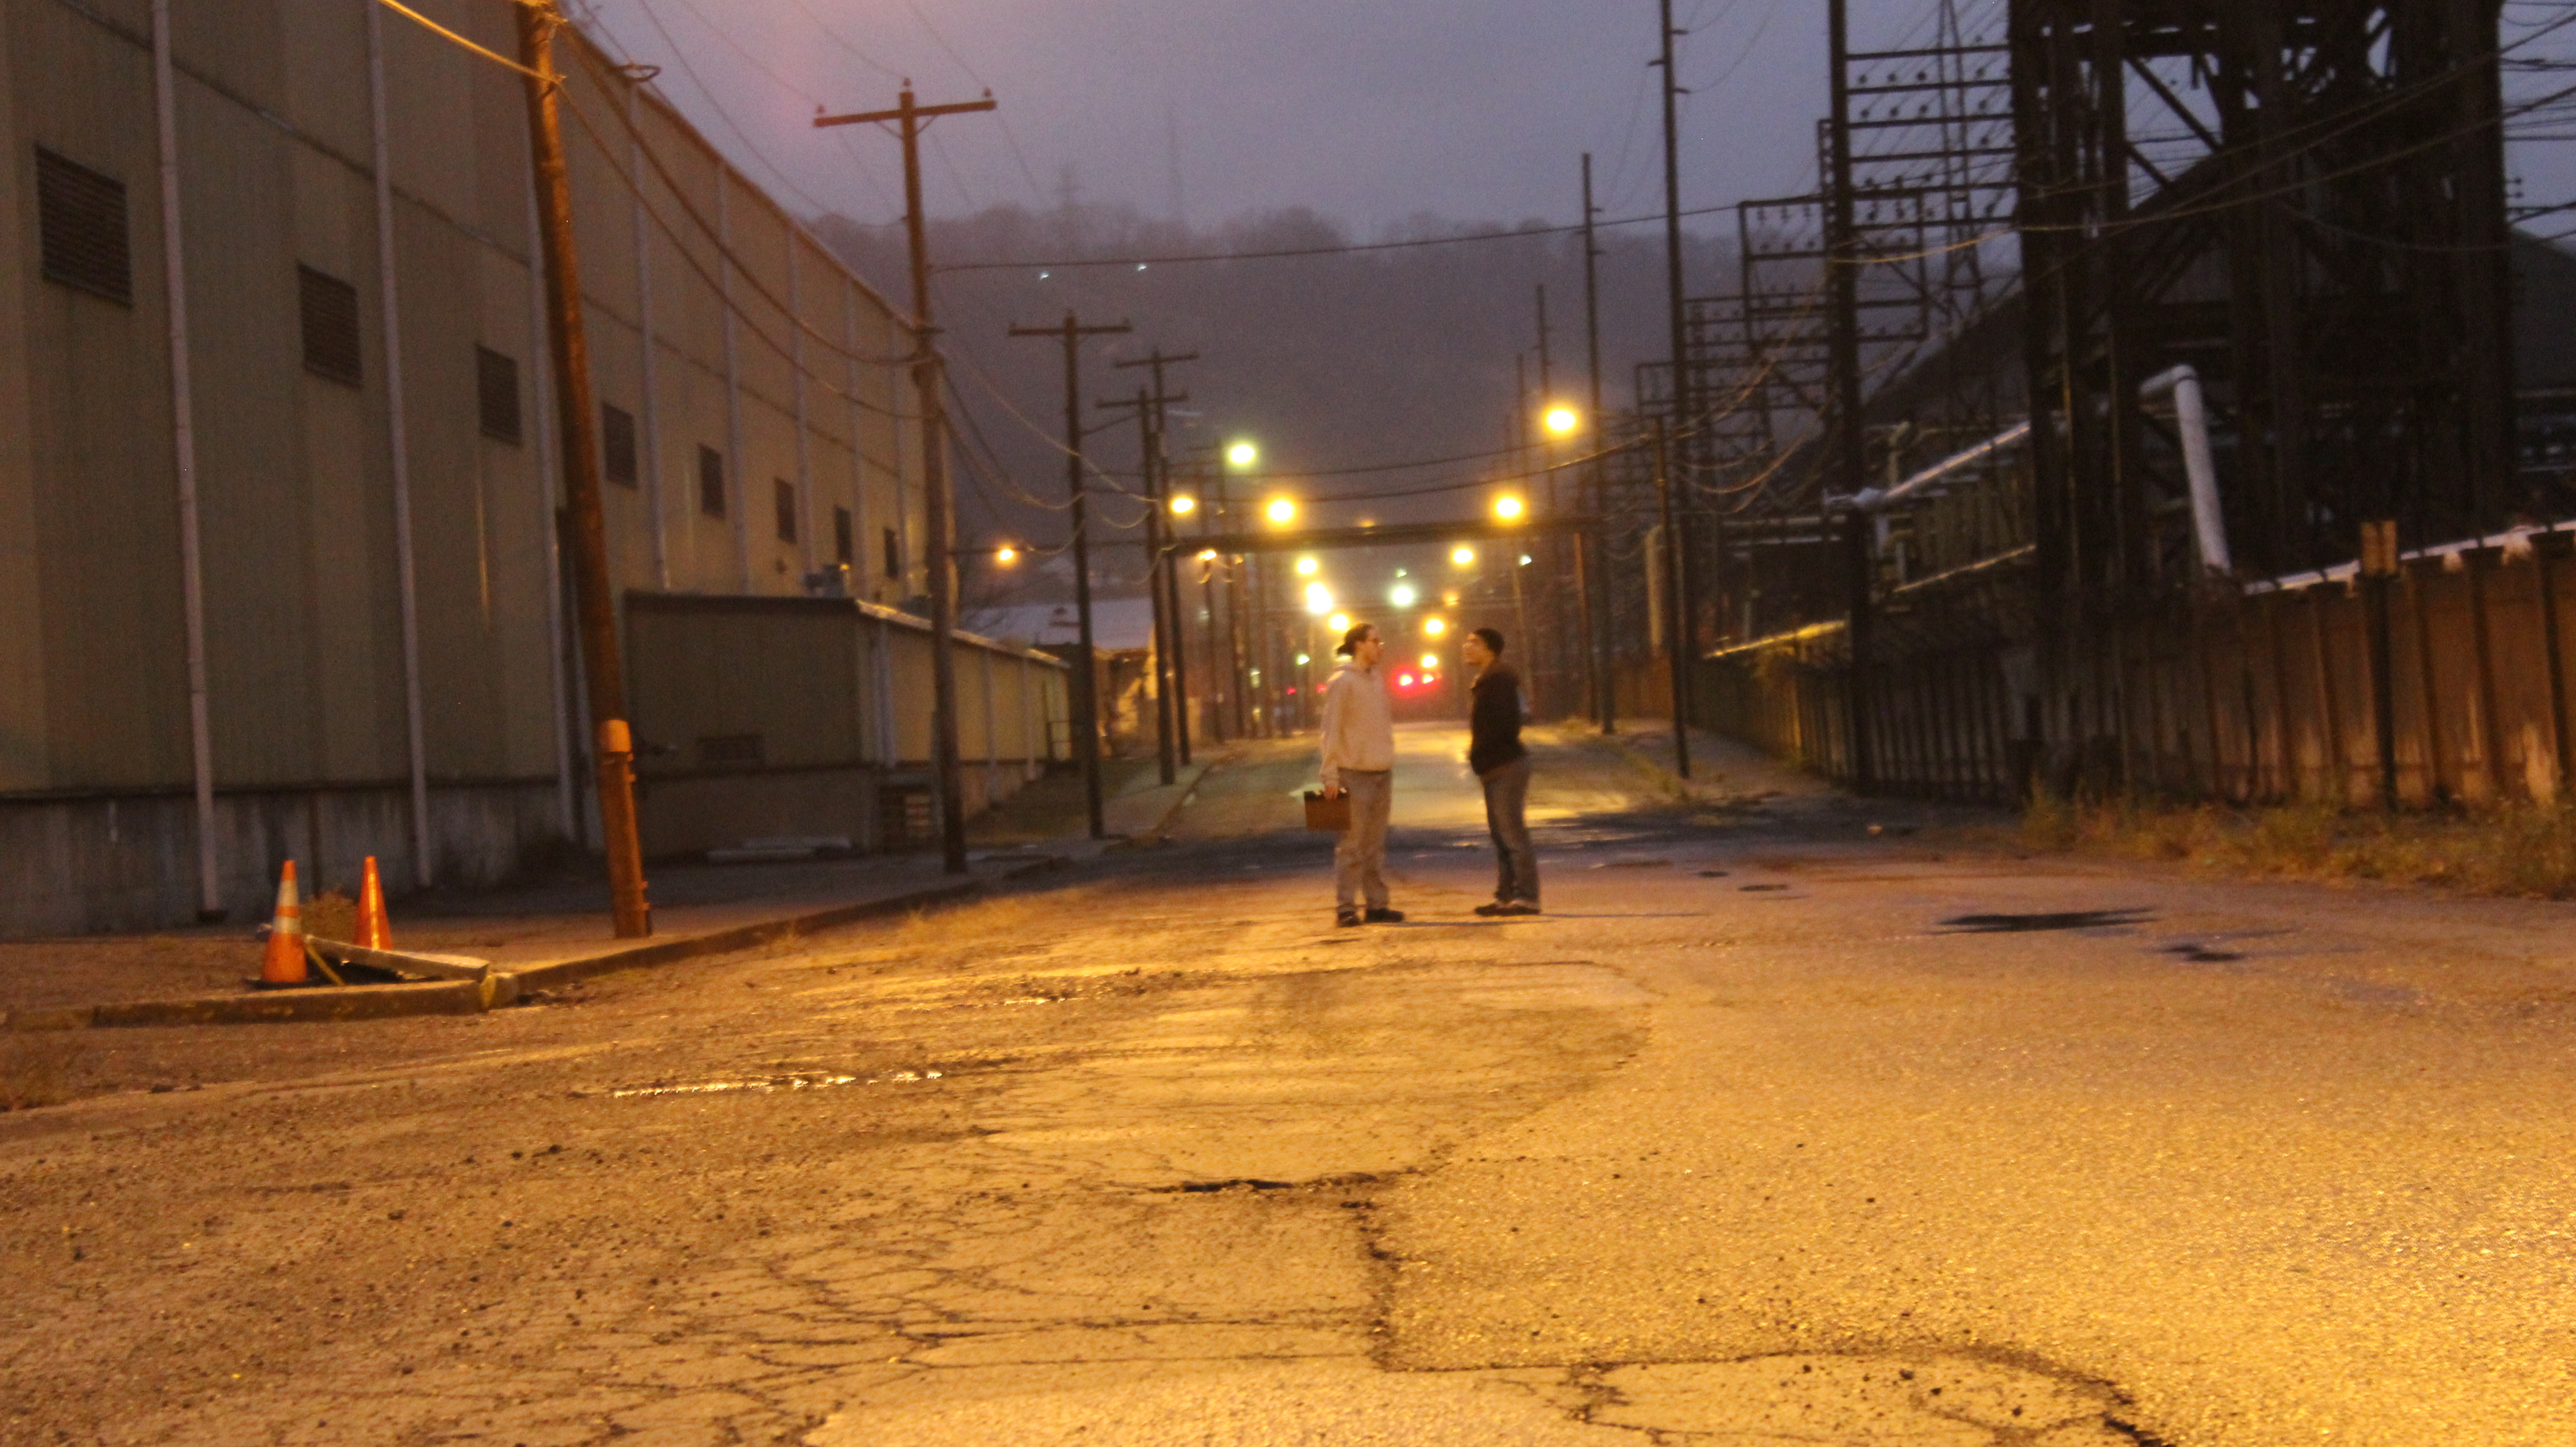 Hank Meldrum and Anthony Soliz-Rocha in Breakthrough (2017)